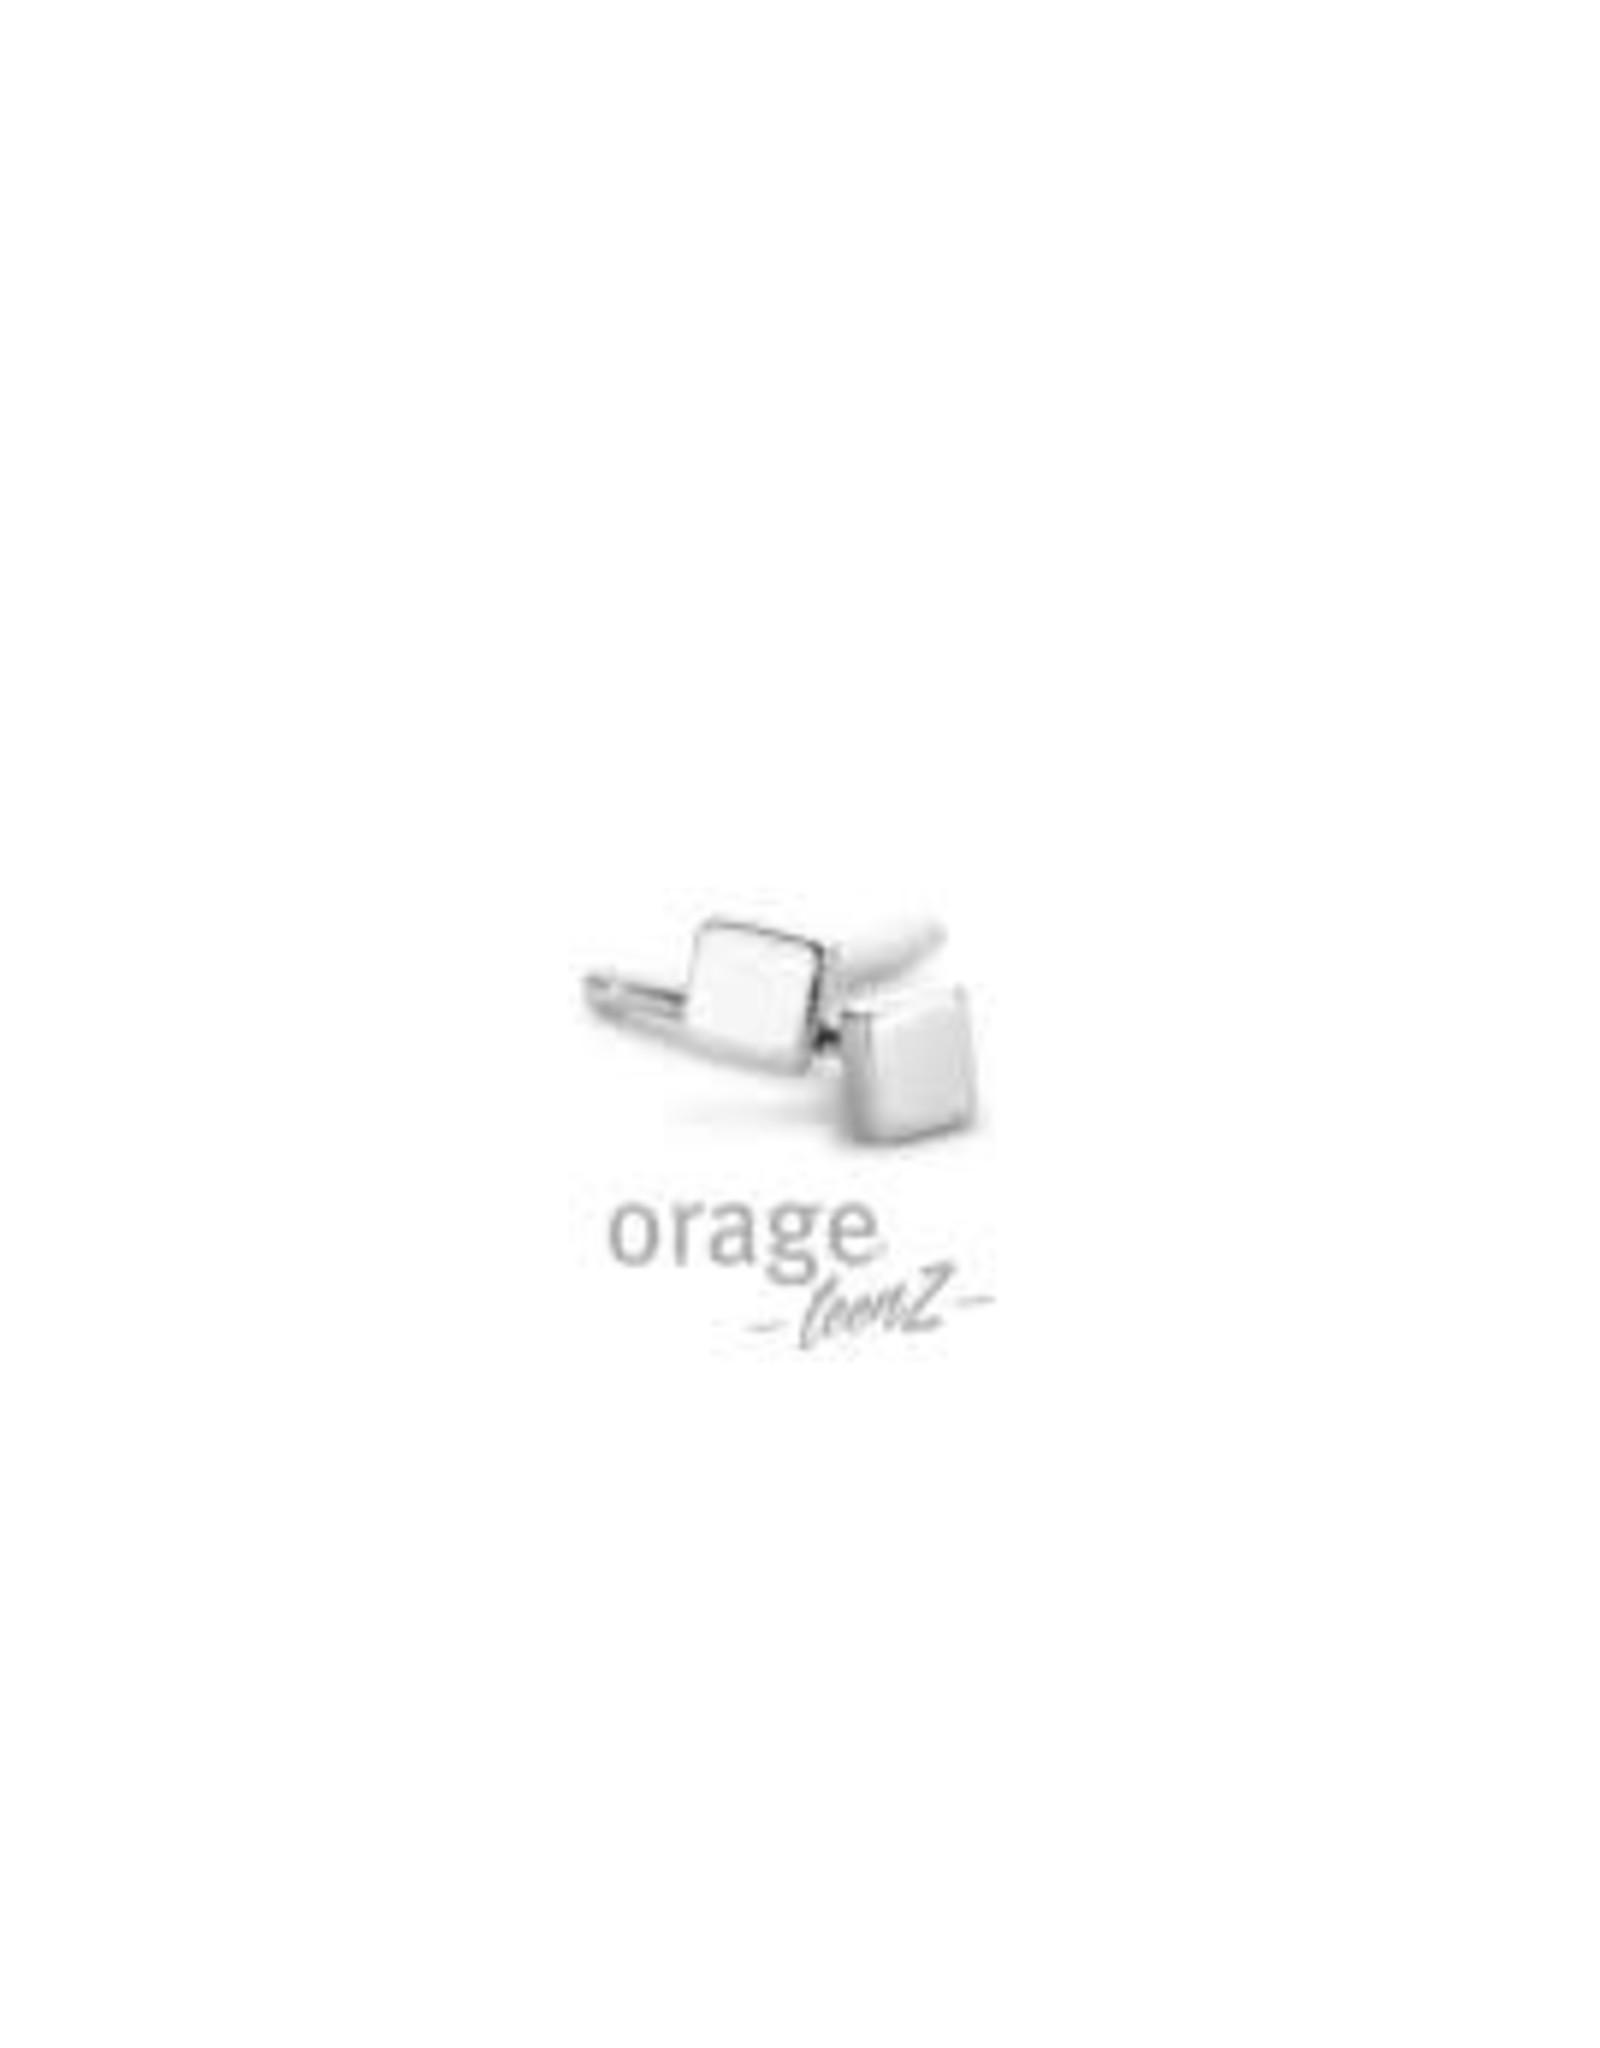 Orage Teenz Oorbellen Orage Zilver T336